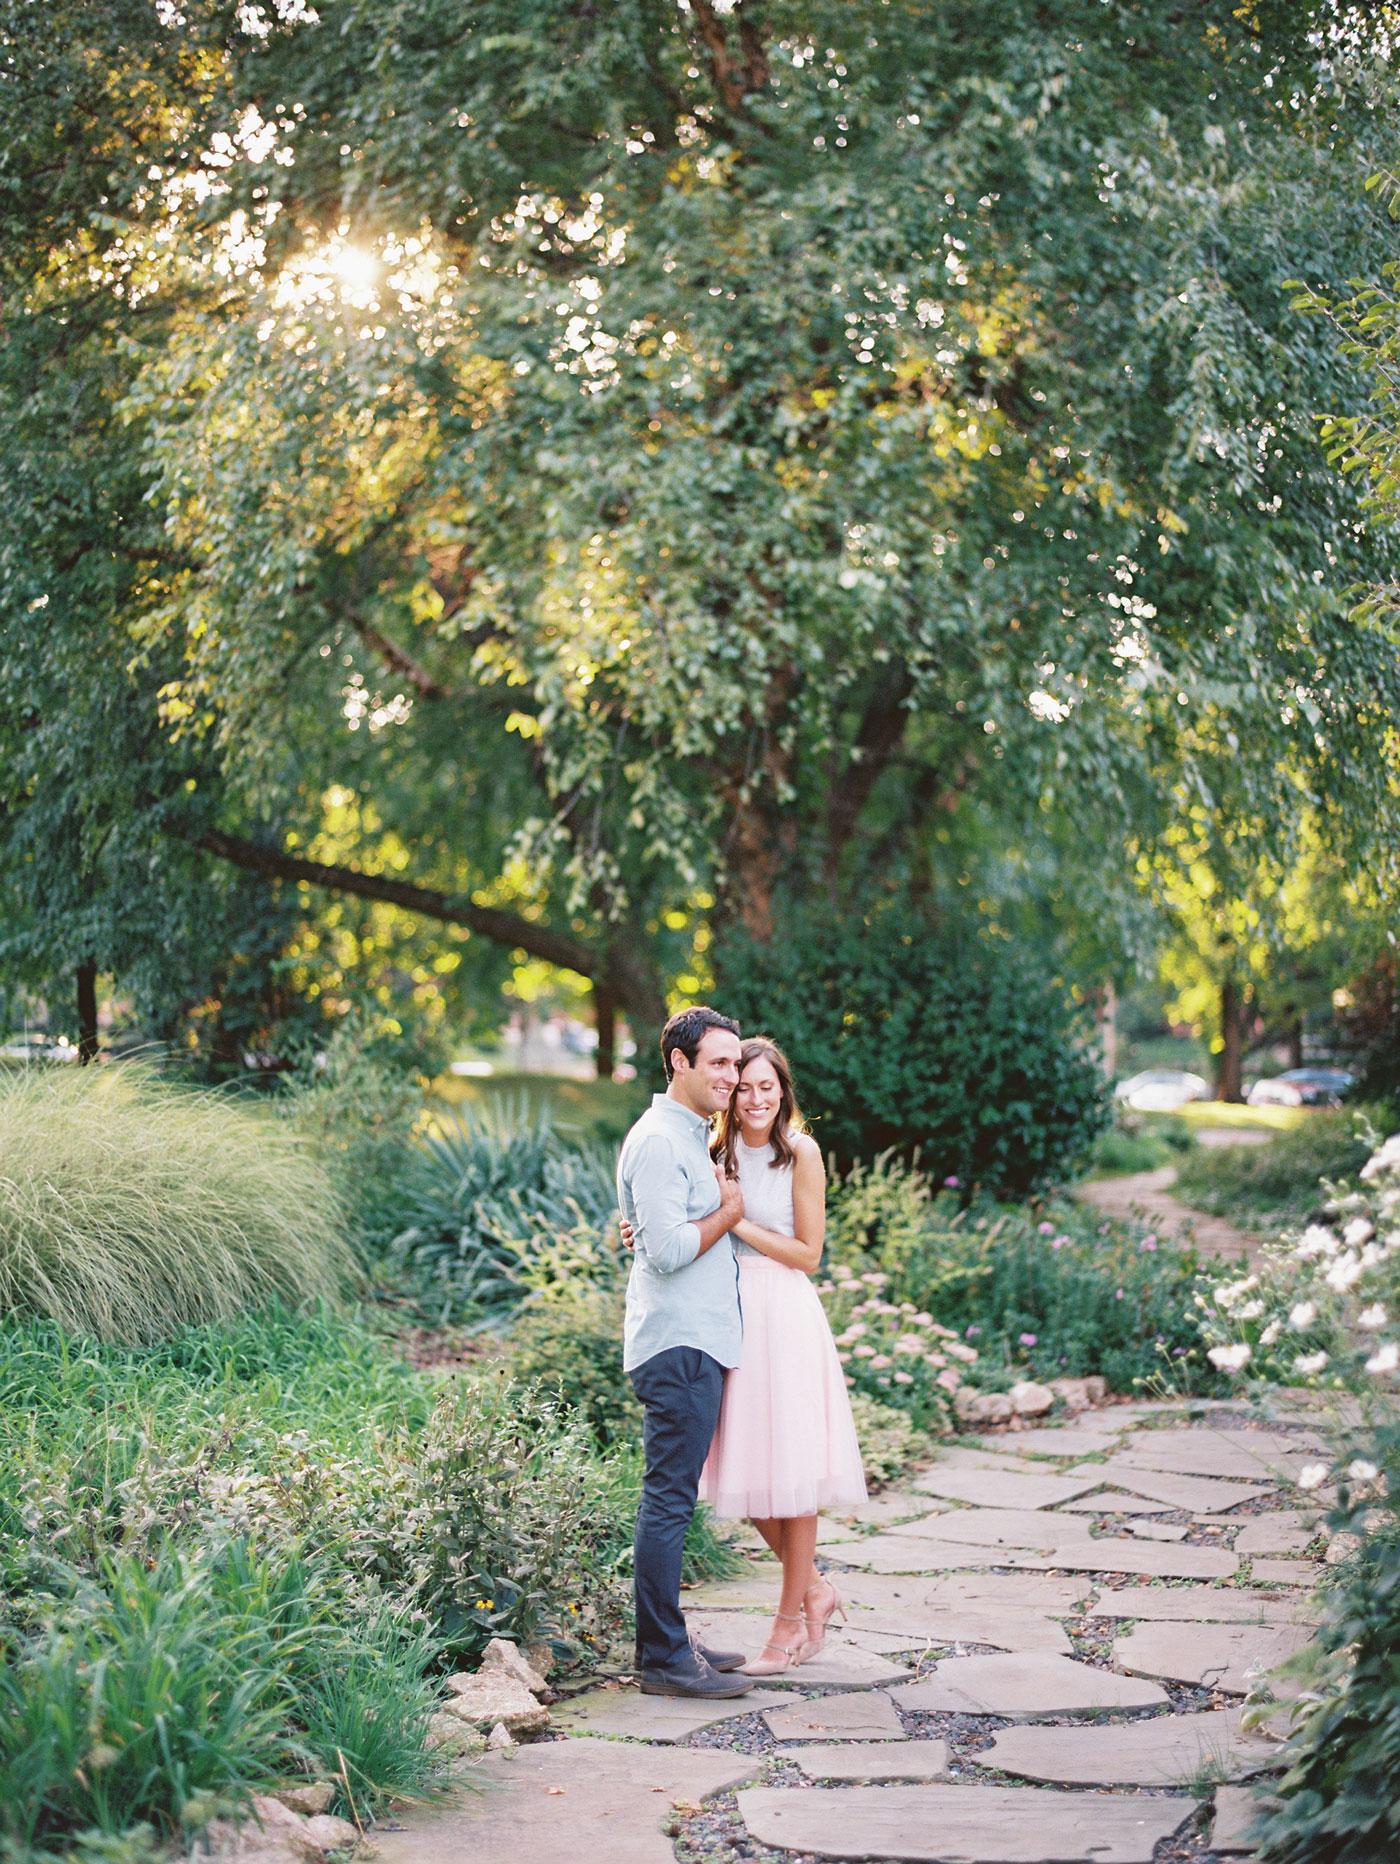 Summer Engagement photos St. Louis